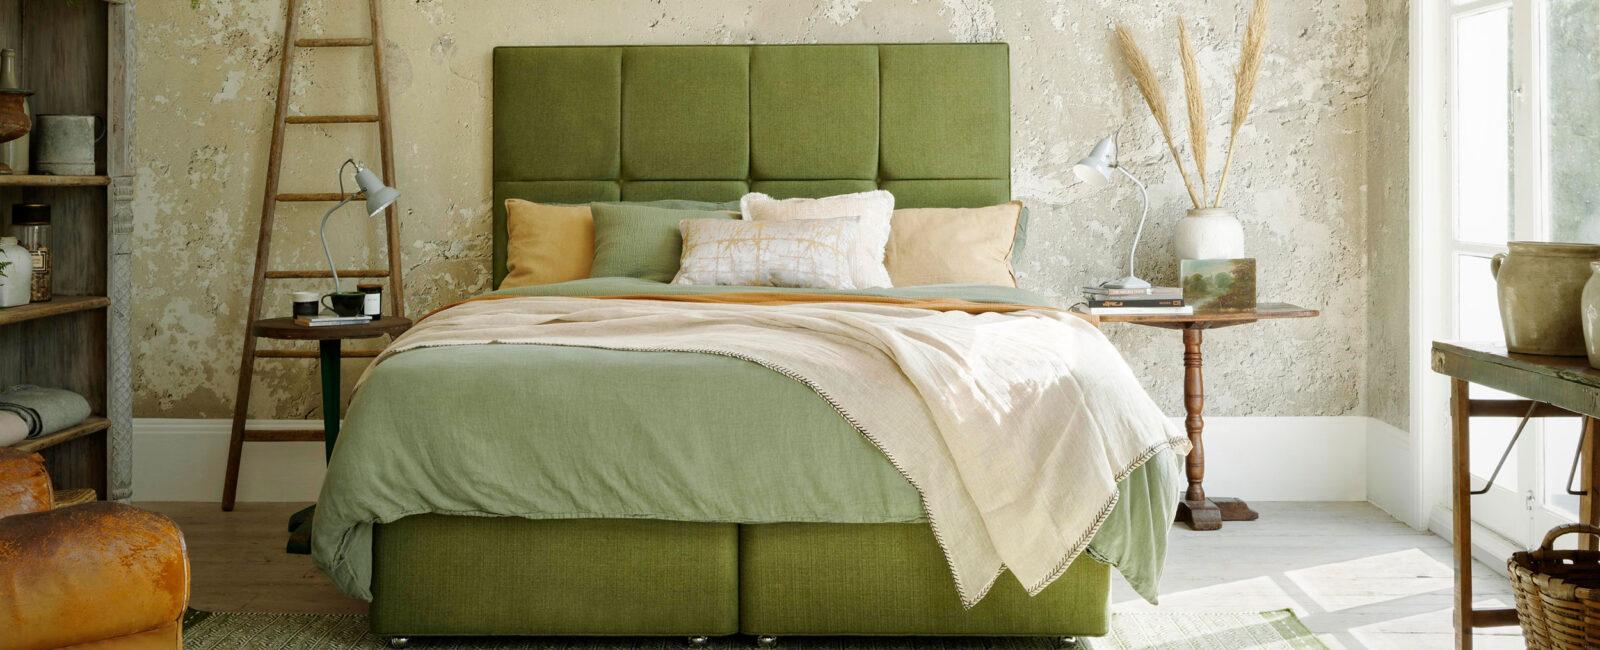 Hypnos divan bed and headboard green